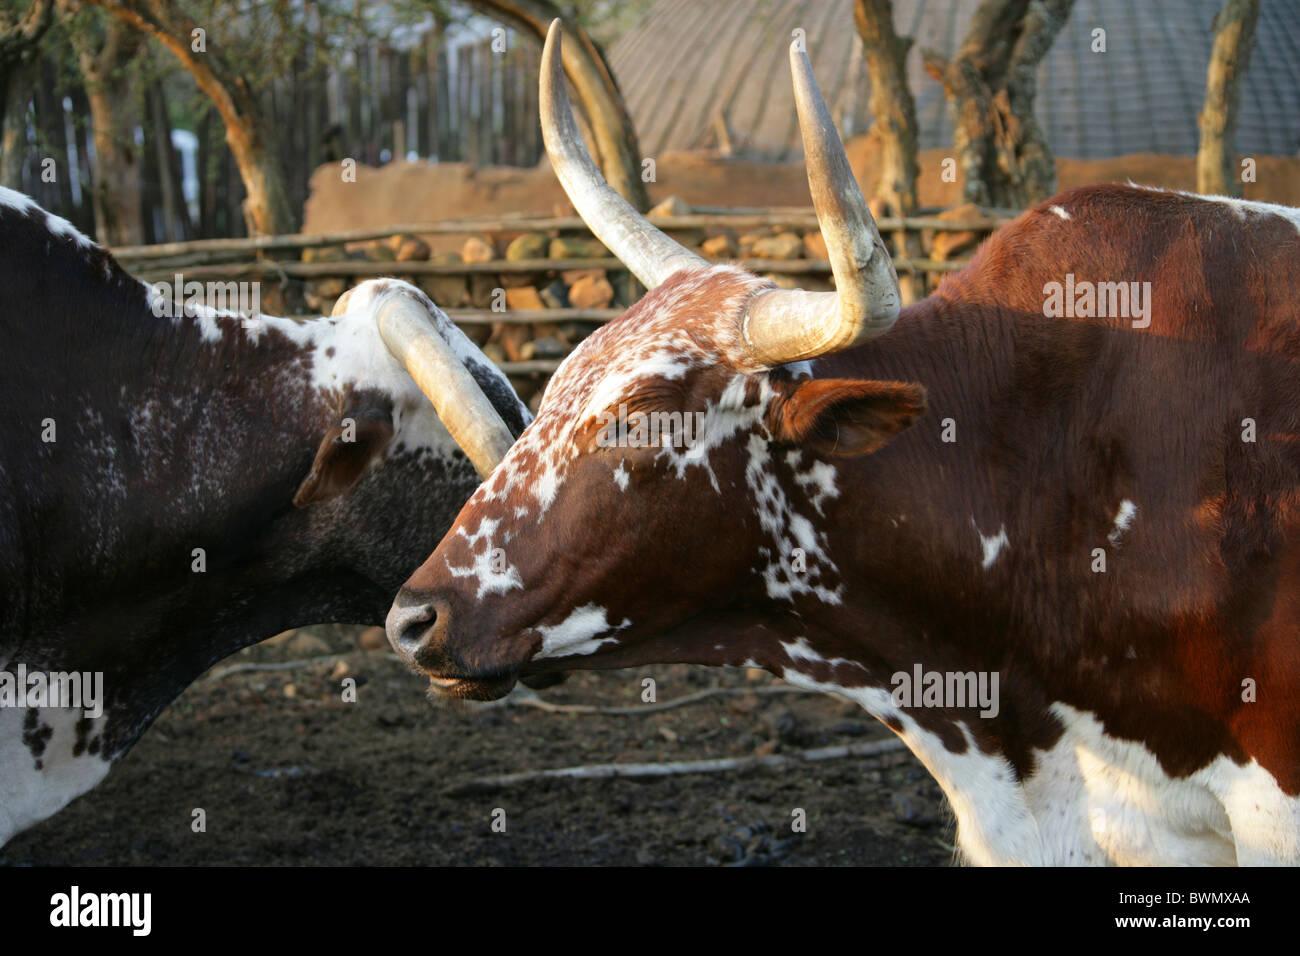 Nguni Cattle in a Kraal, Shakaland Zulu Village, Nkwalini Valley, Kwazulu Natal, South Africa. Stock Photo